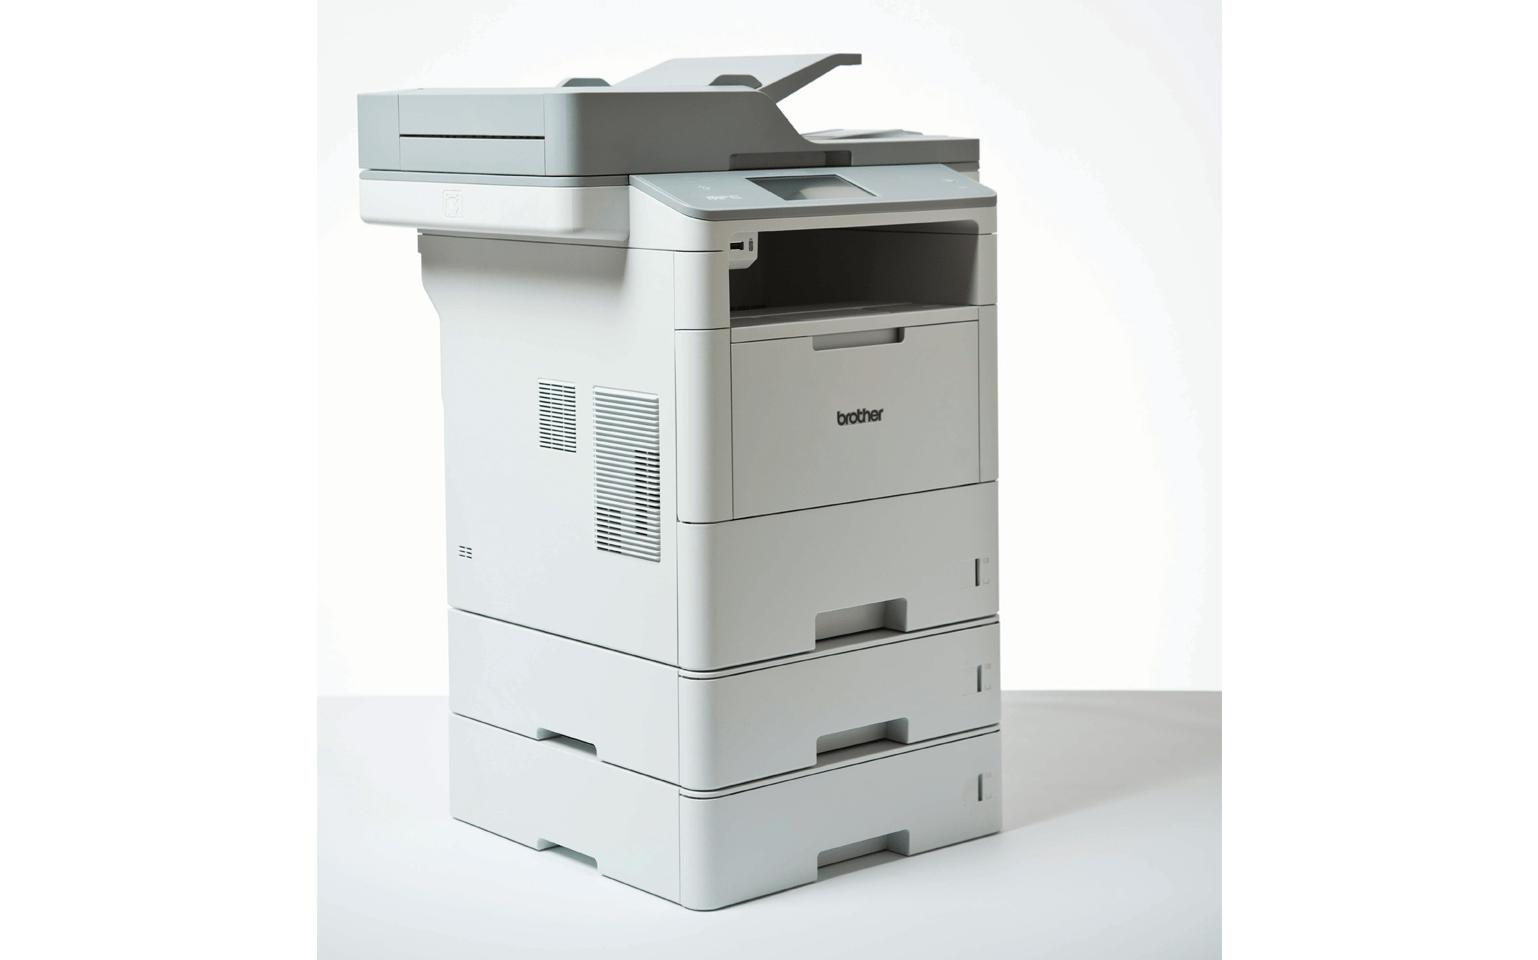 MFC-L6900DWT Wireless Mono Laser Printer 4